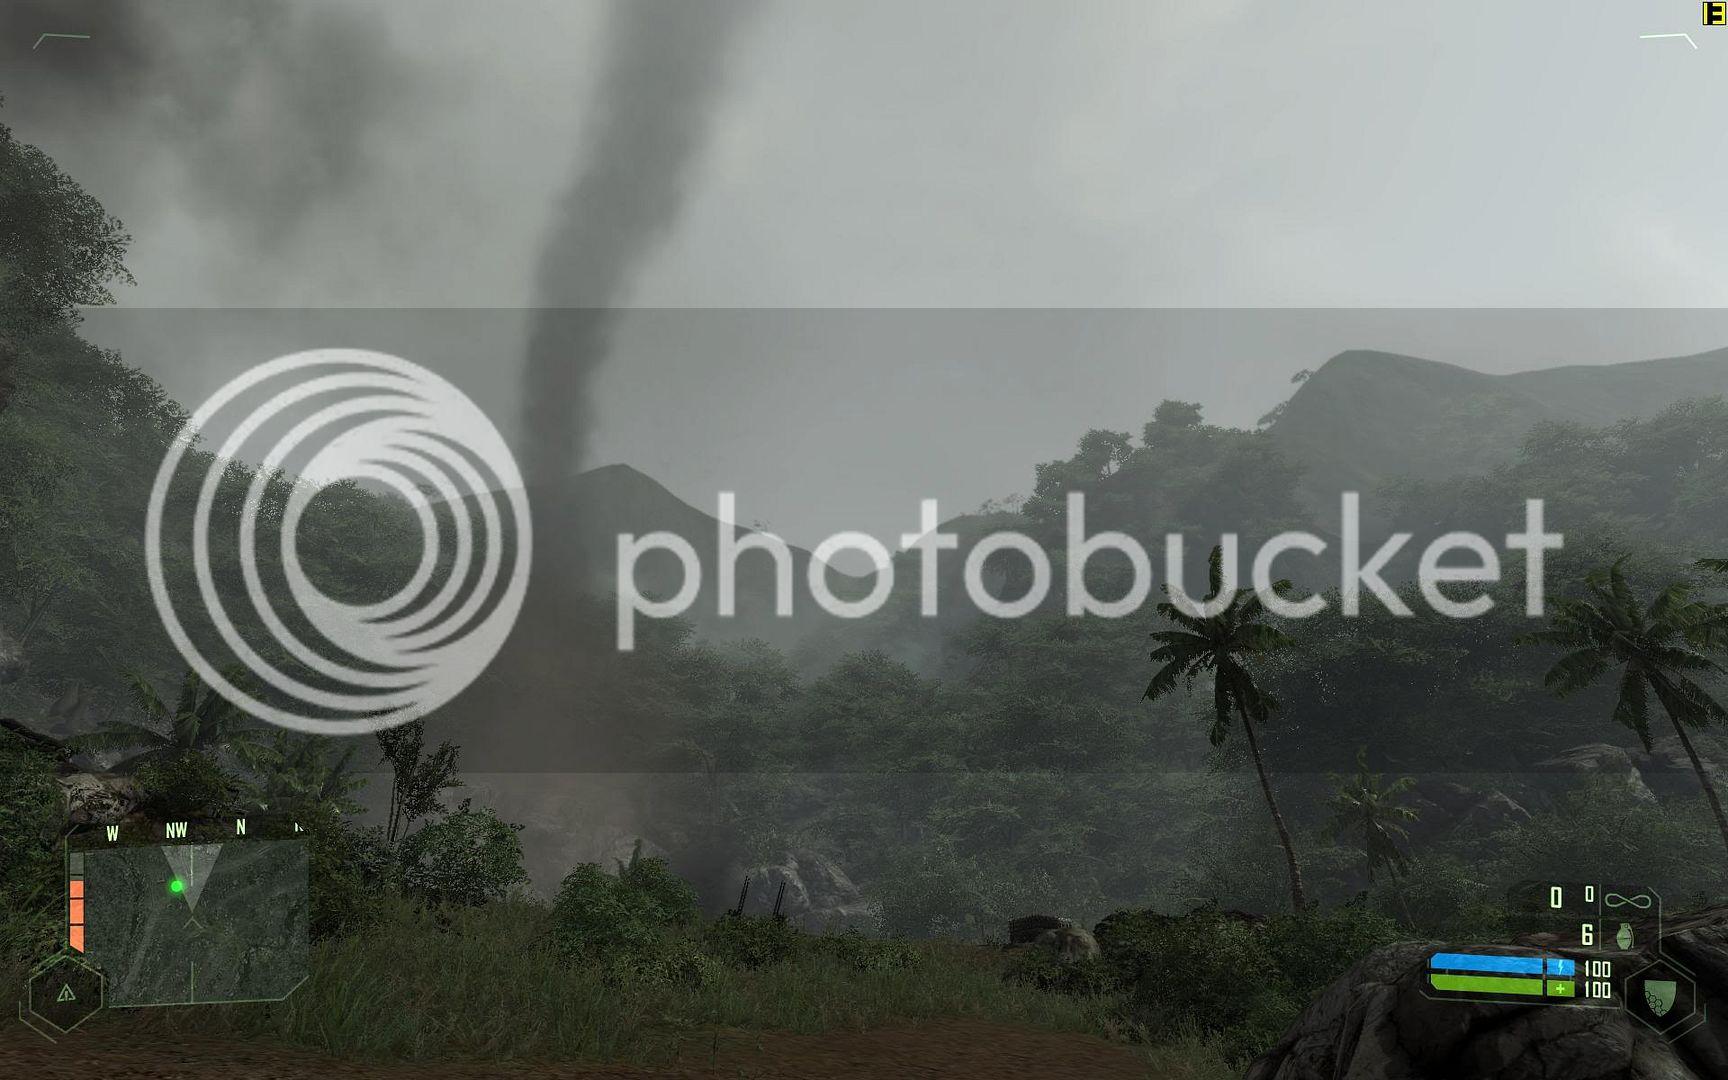 http://i213.photobucket.com/albums/cc237/crysisscreens/Crysis2007-11-1220-46-30-63.jpg